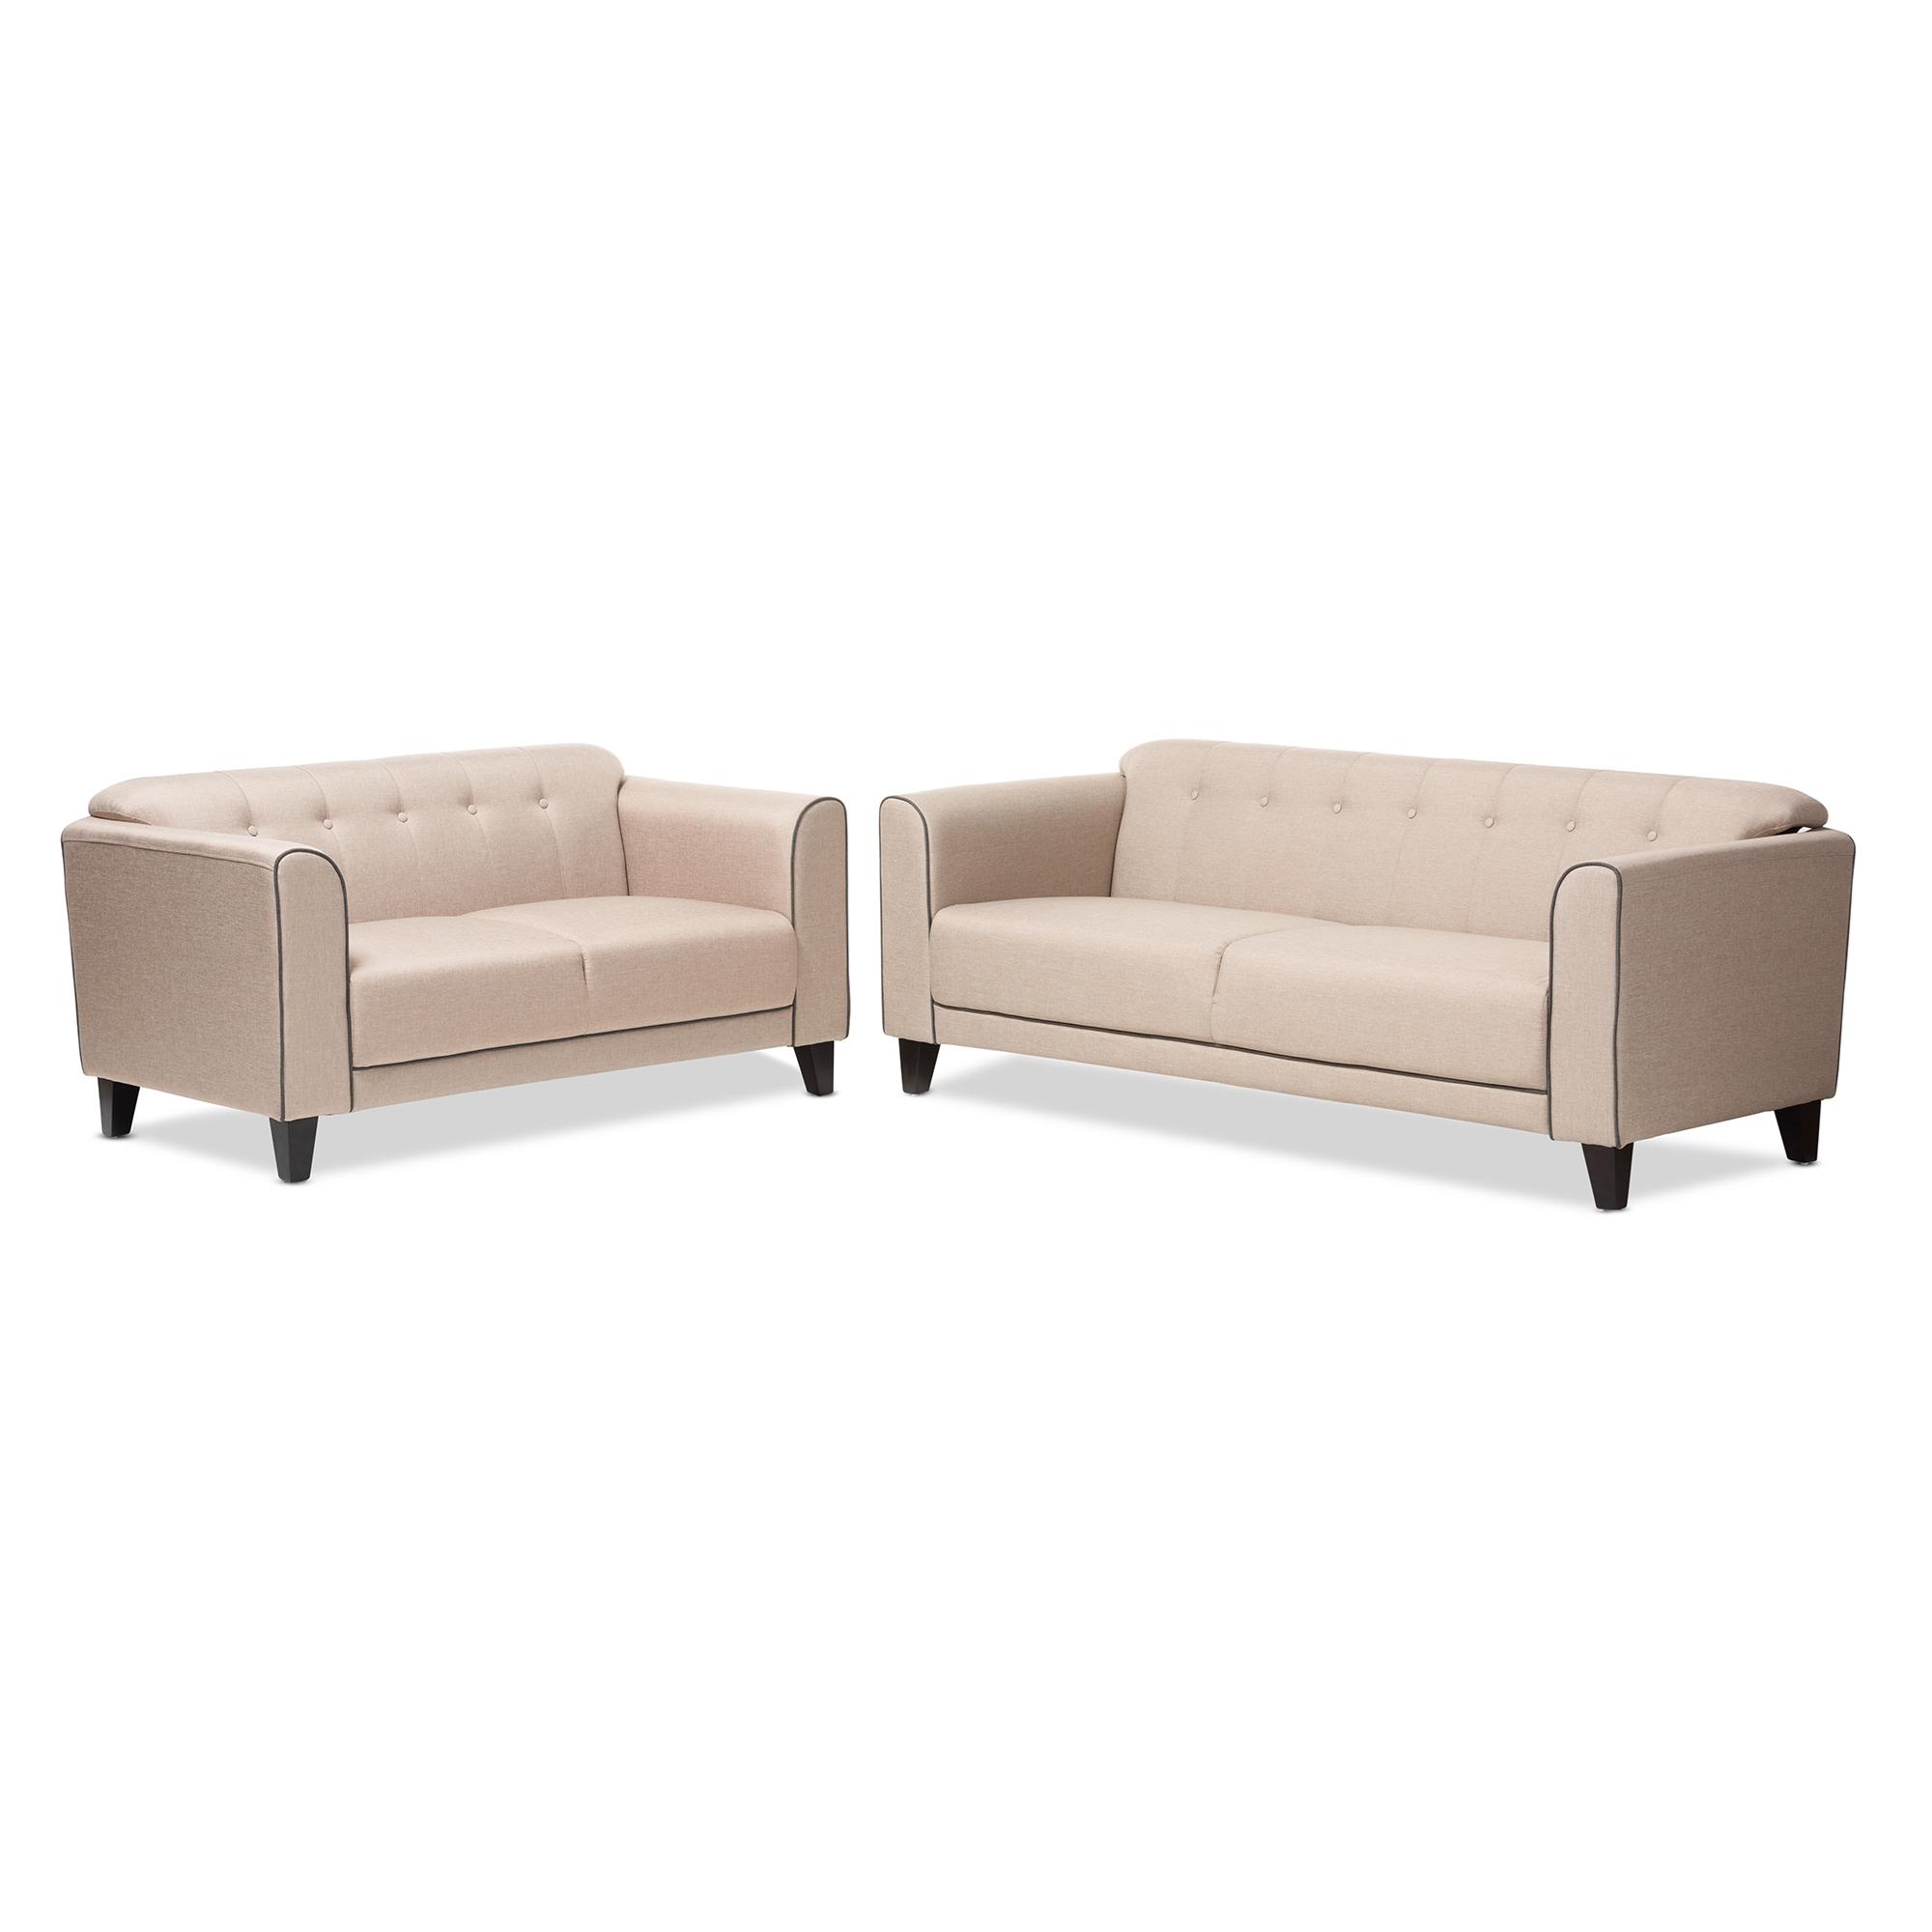 Beige Sofa Set Moser Bay Furniture Garcia Collection Linen And